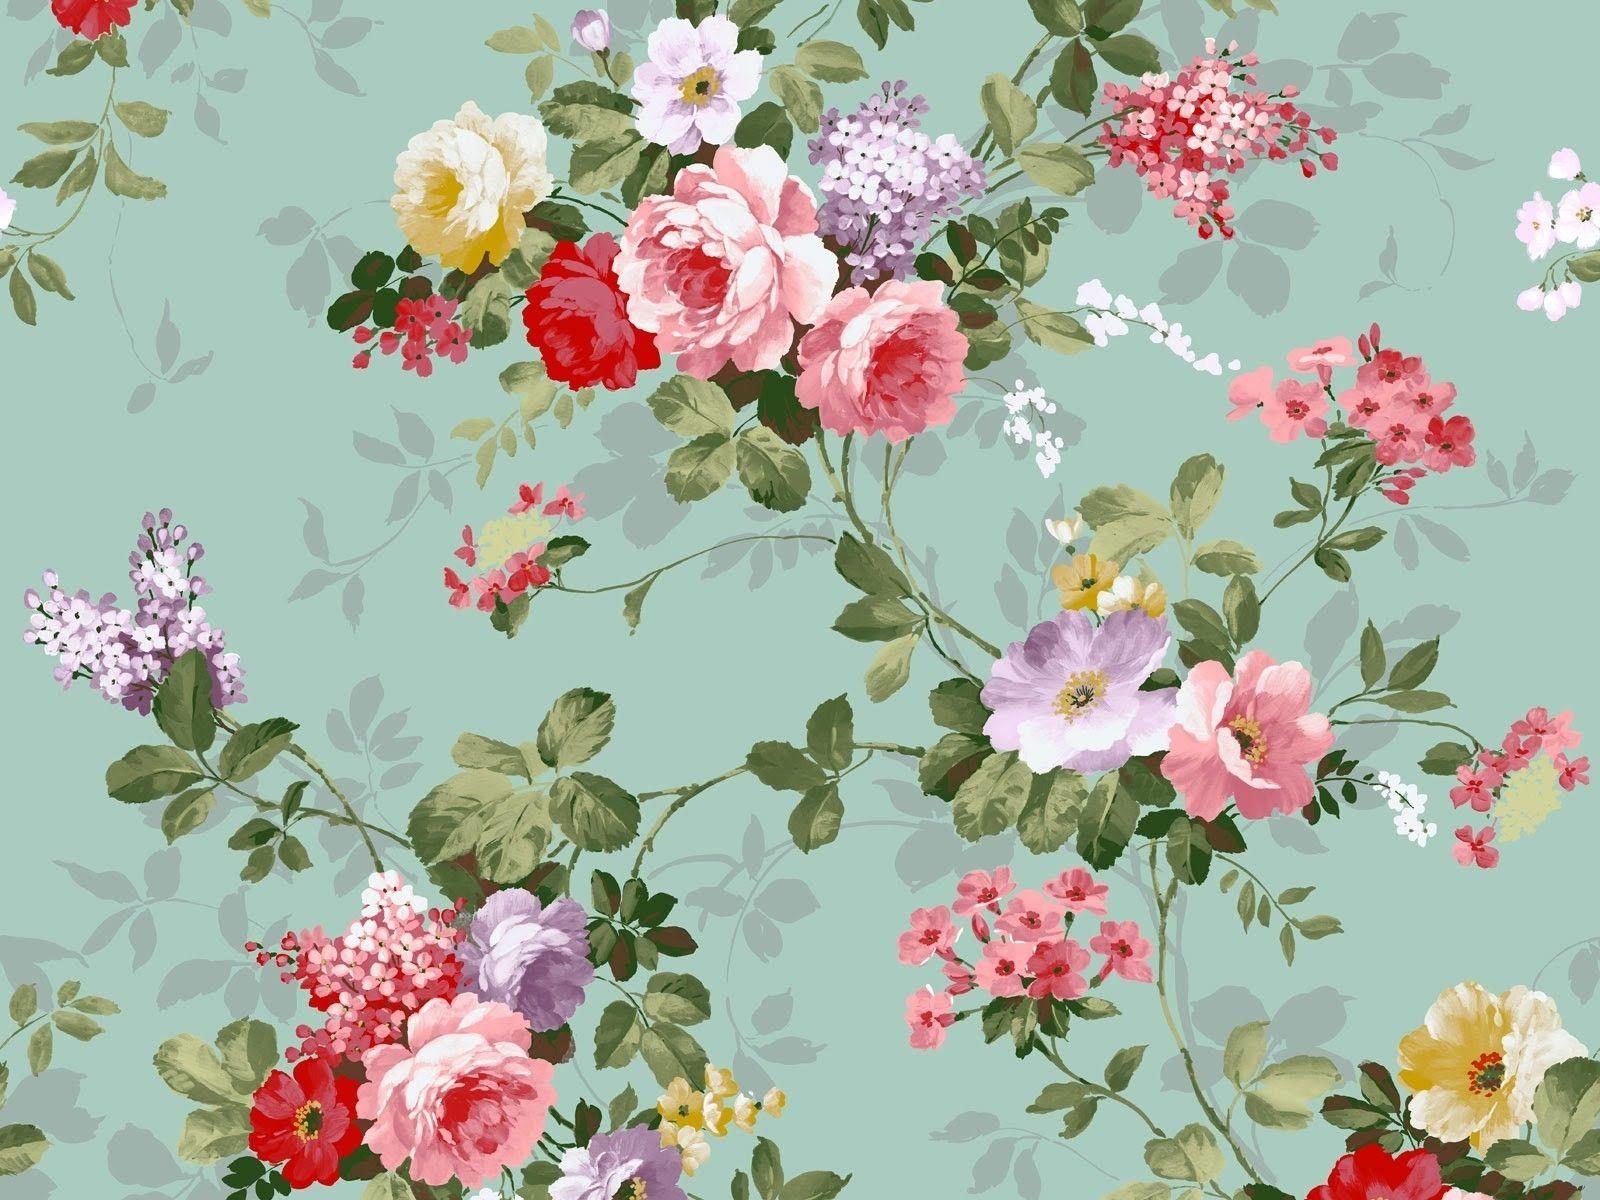 10 Latest Vintage Floral Wallpaper Desktop Full Hd 1080p For Pc